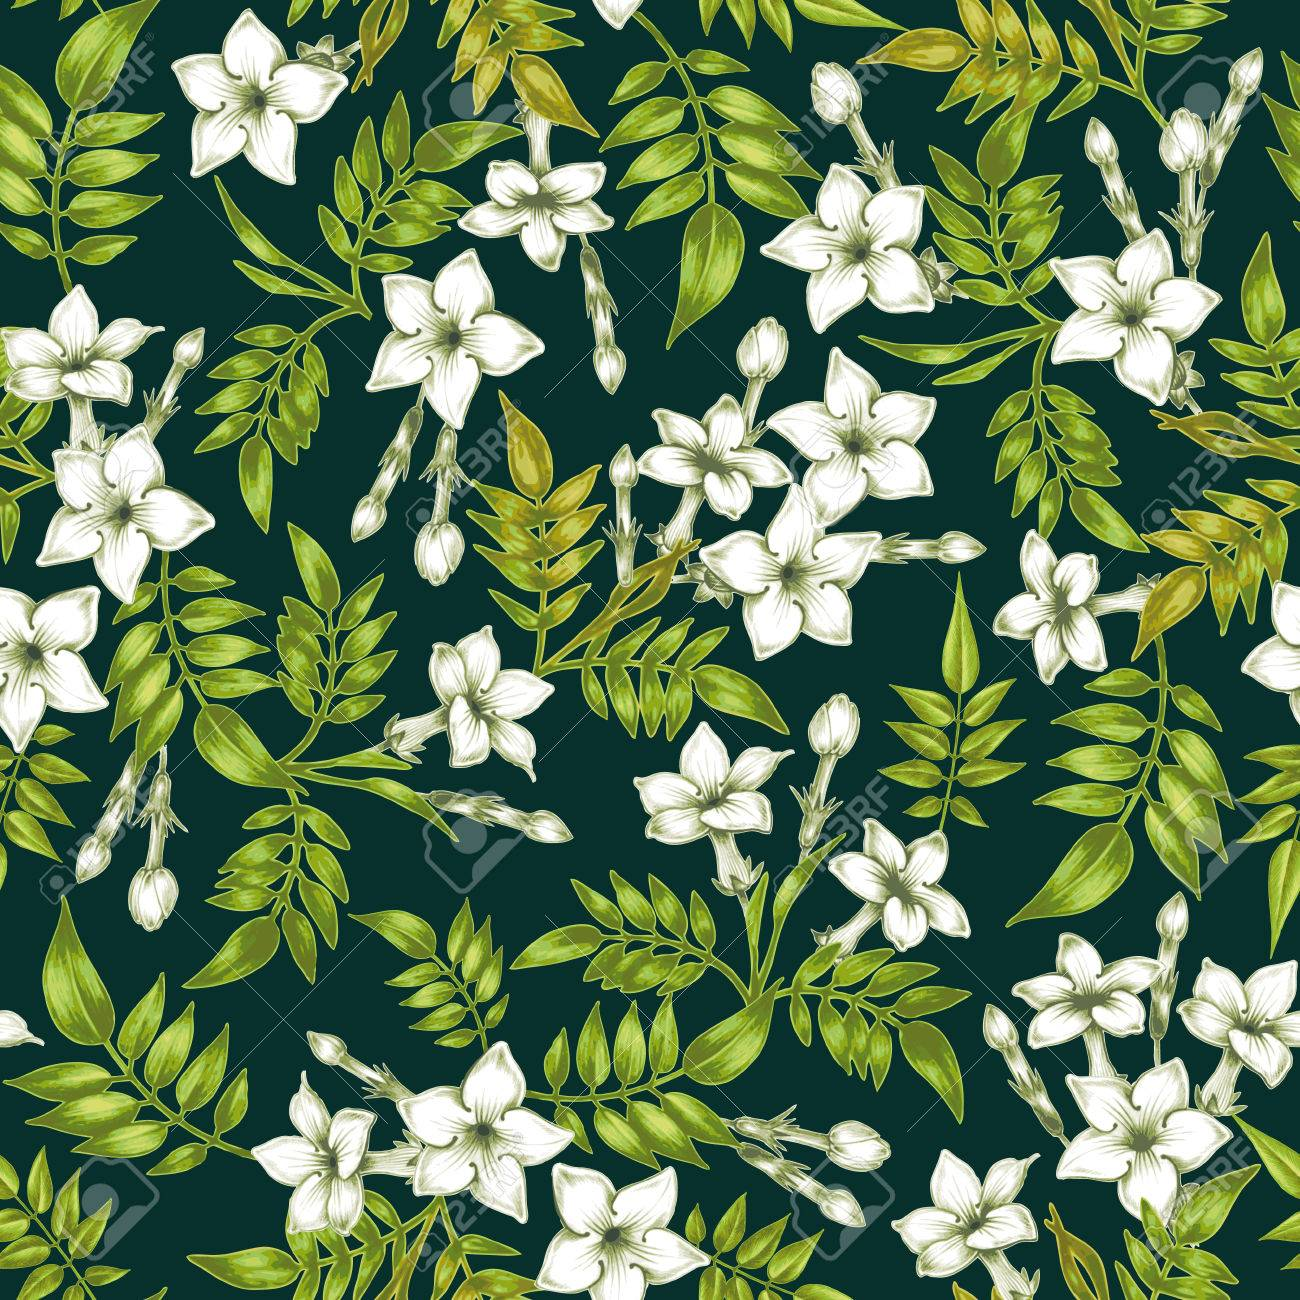 Vector seamless background. Jasmine flowers.Design for fabrics, textiles, paper, wallpaper, web. Vintage. Floral ornament. - 55307027